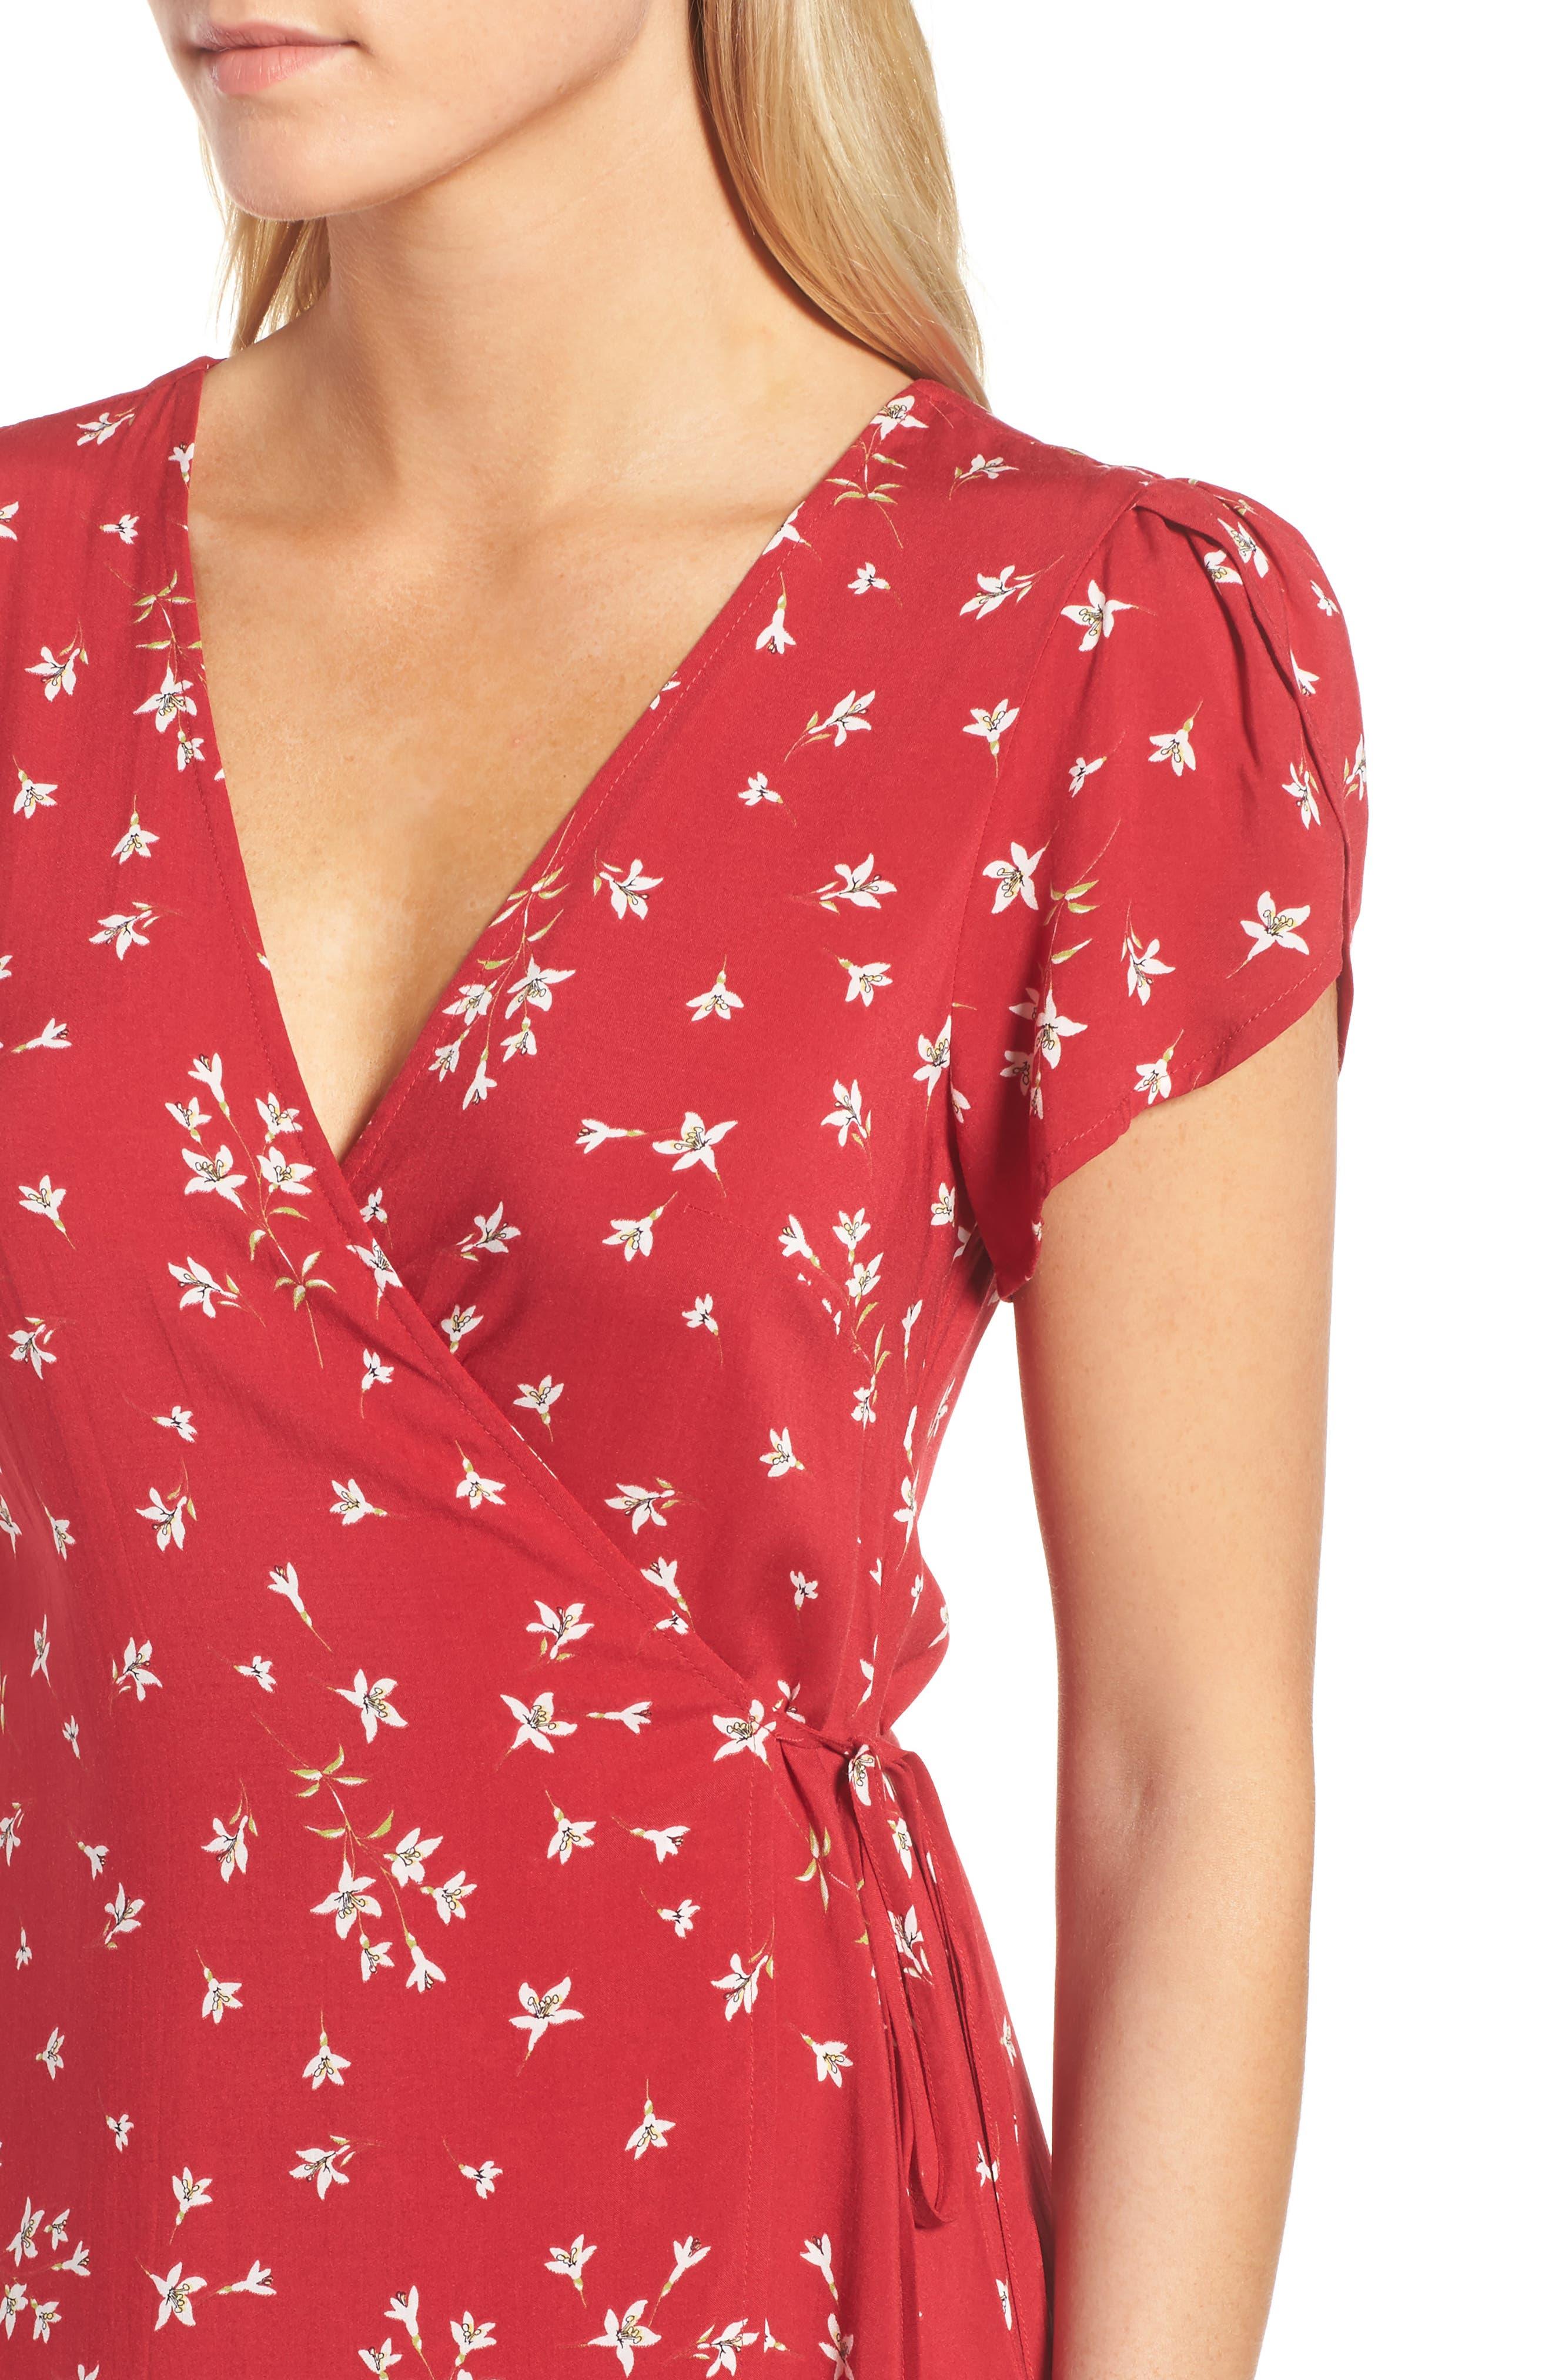 Spring Floral Wrap Dress,                             Alternate thumbnail 4, color,                             600